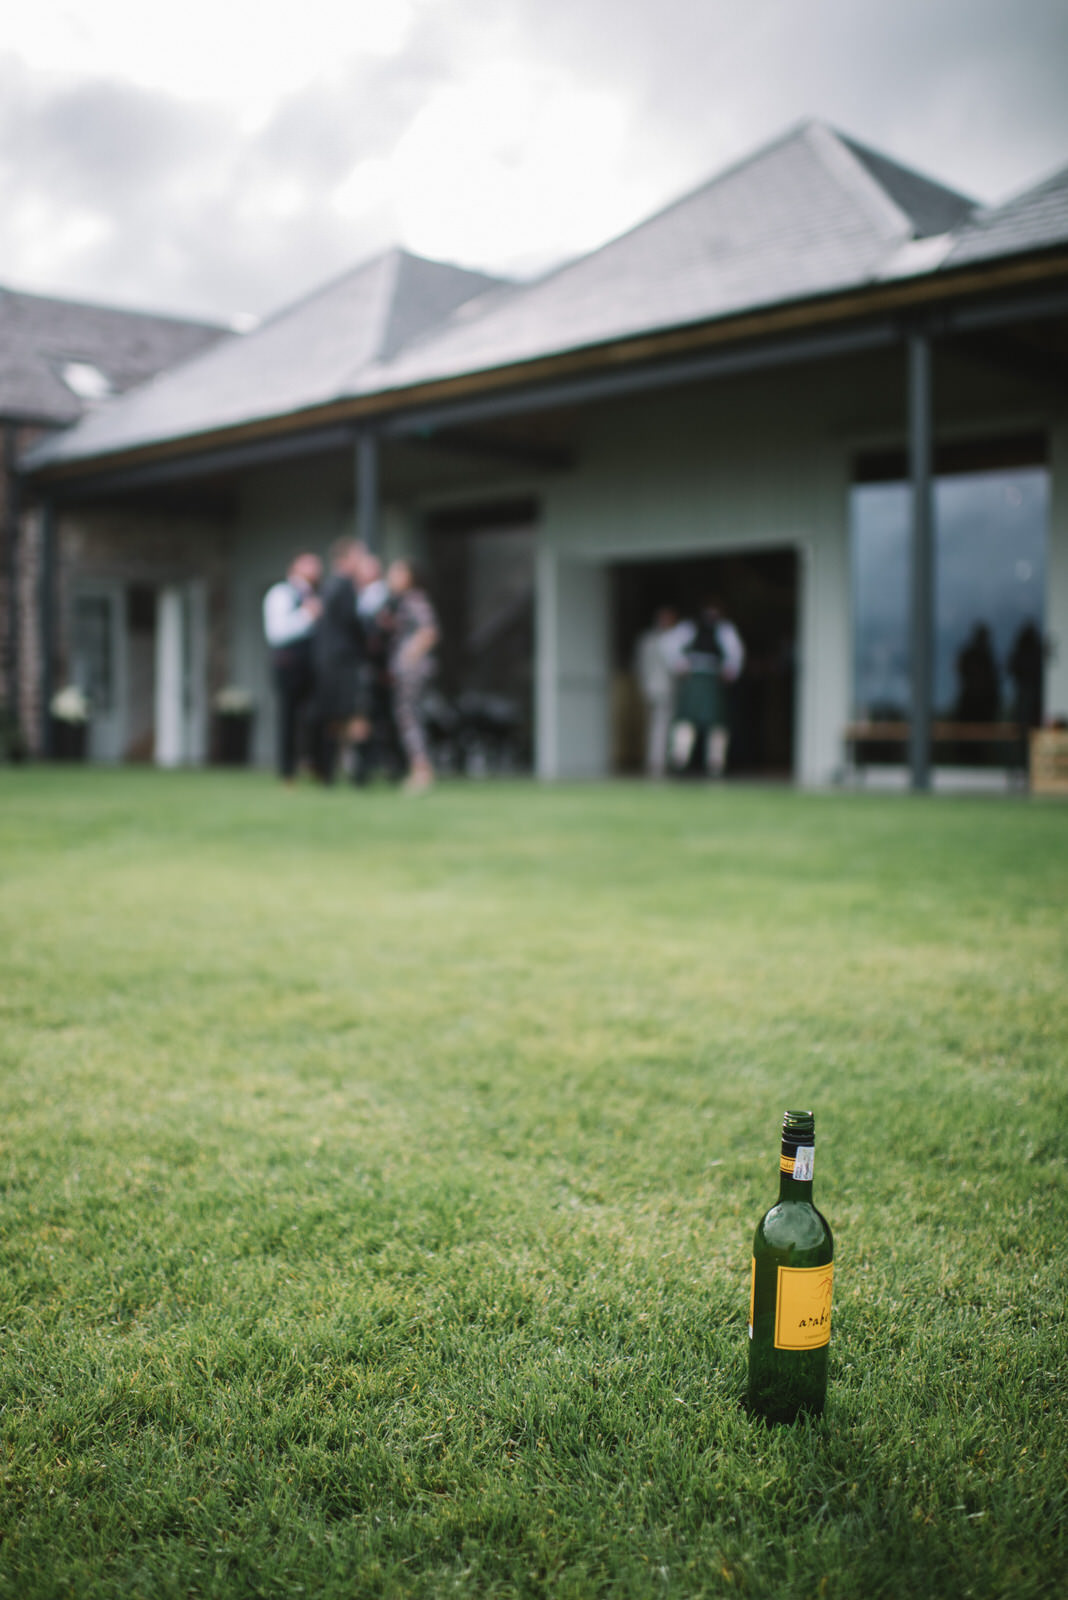 056-GUARDSWELL-FARM-WEDDING-ALTERNATIVE-SCOTTISH-WEDDING-PHOTOGRAPHER-SCOTTISH-WEDDING-DESTINATION-WEDDING-PHOTOGRAPHER.JPG